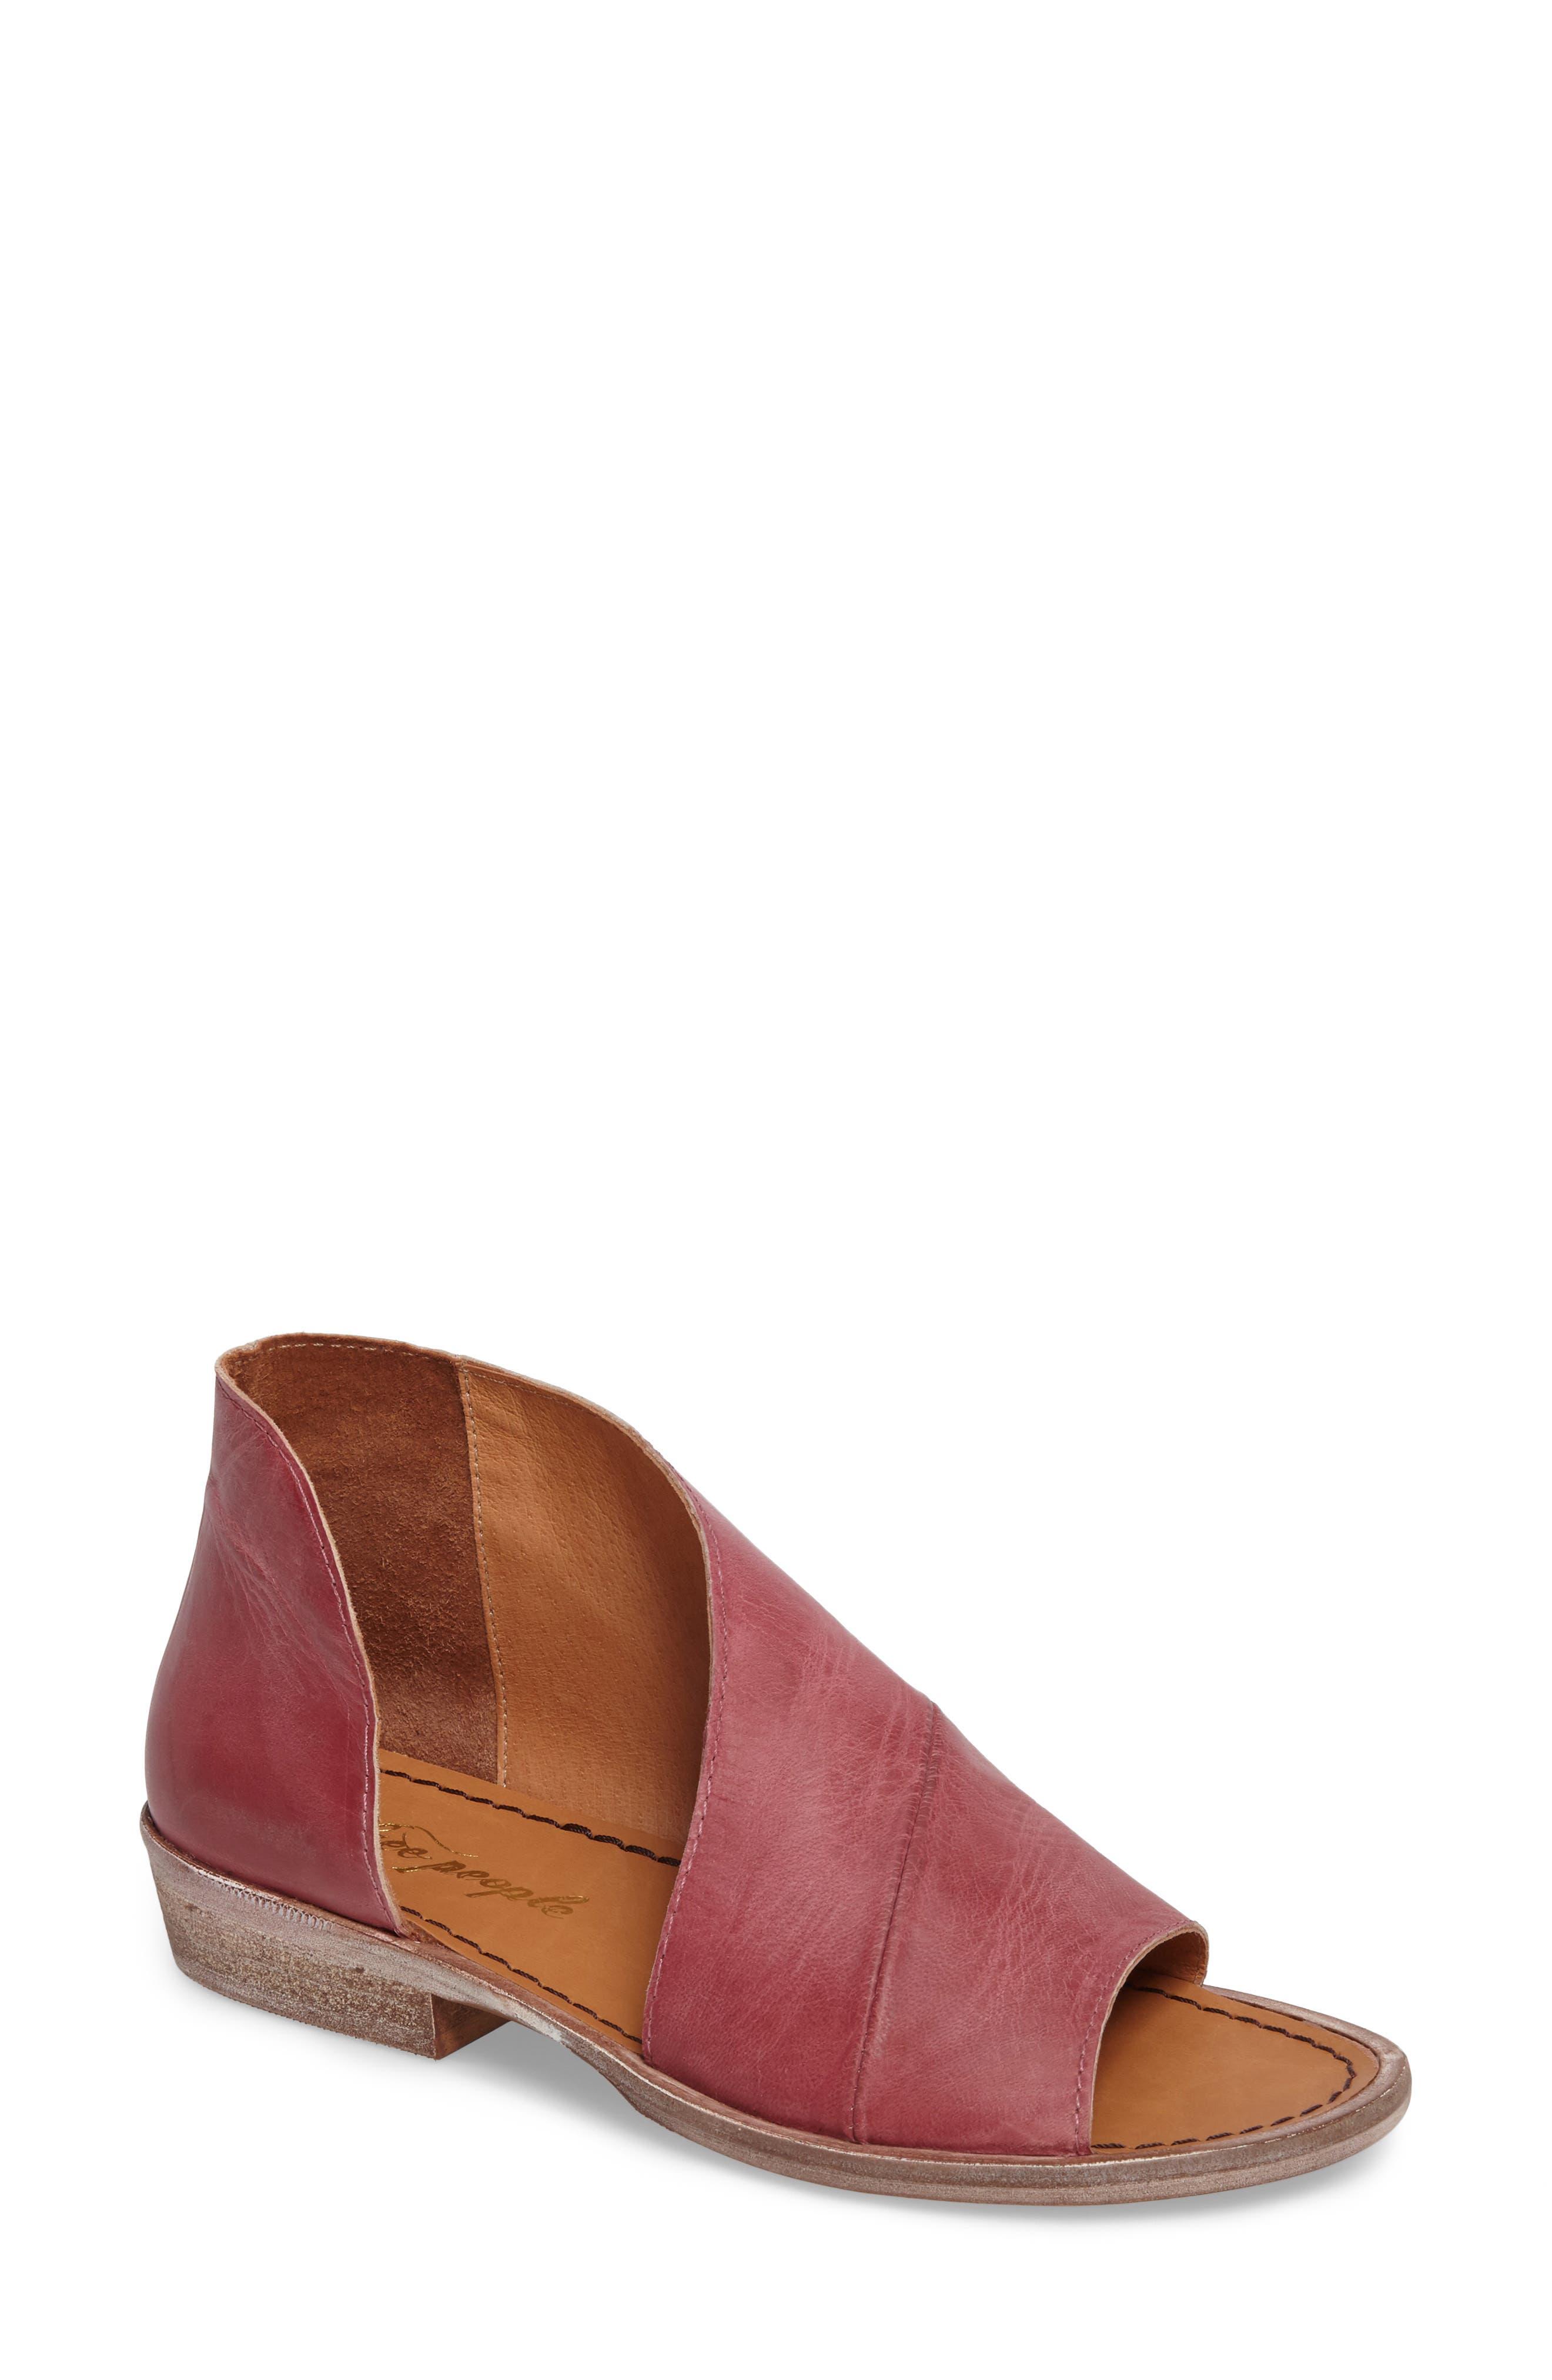 'Mont Blanc' Asymmetrical Sandal,                             Main thumbnail 14, color,